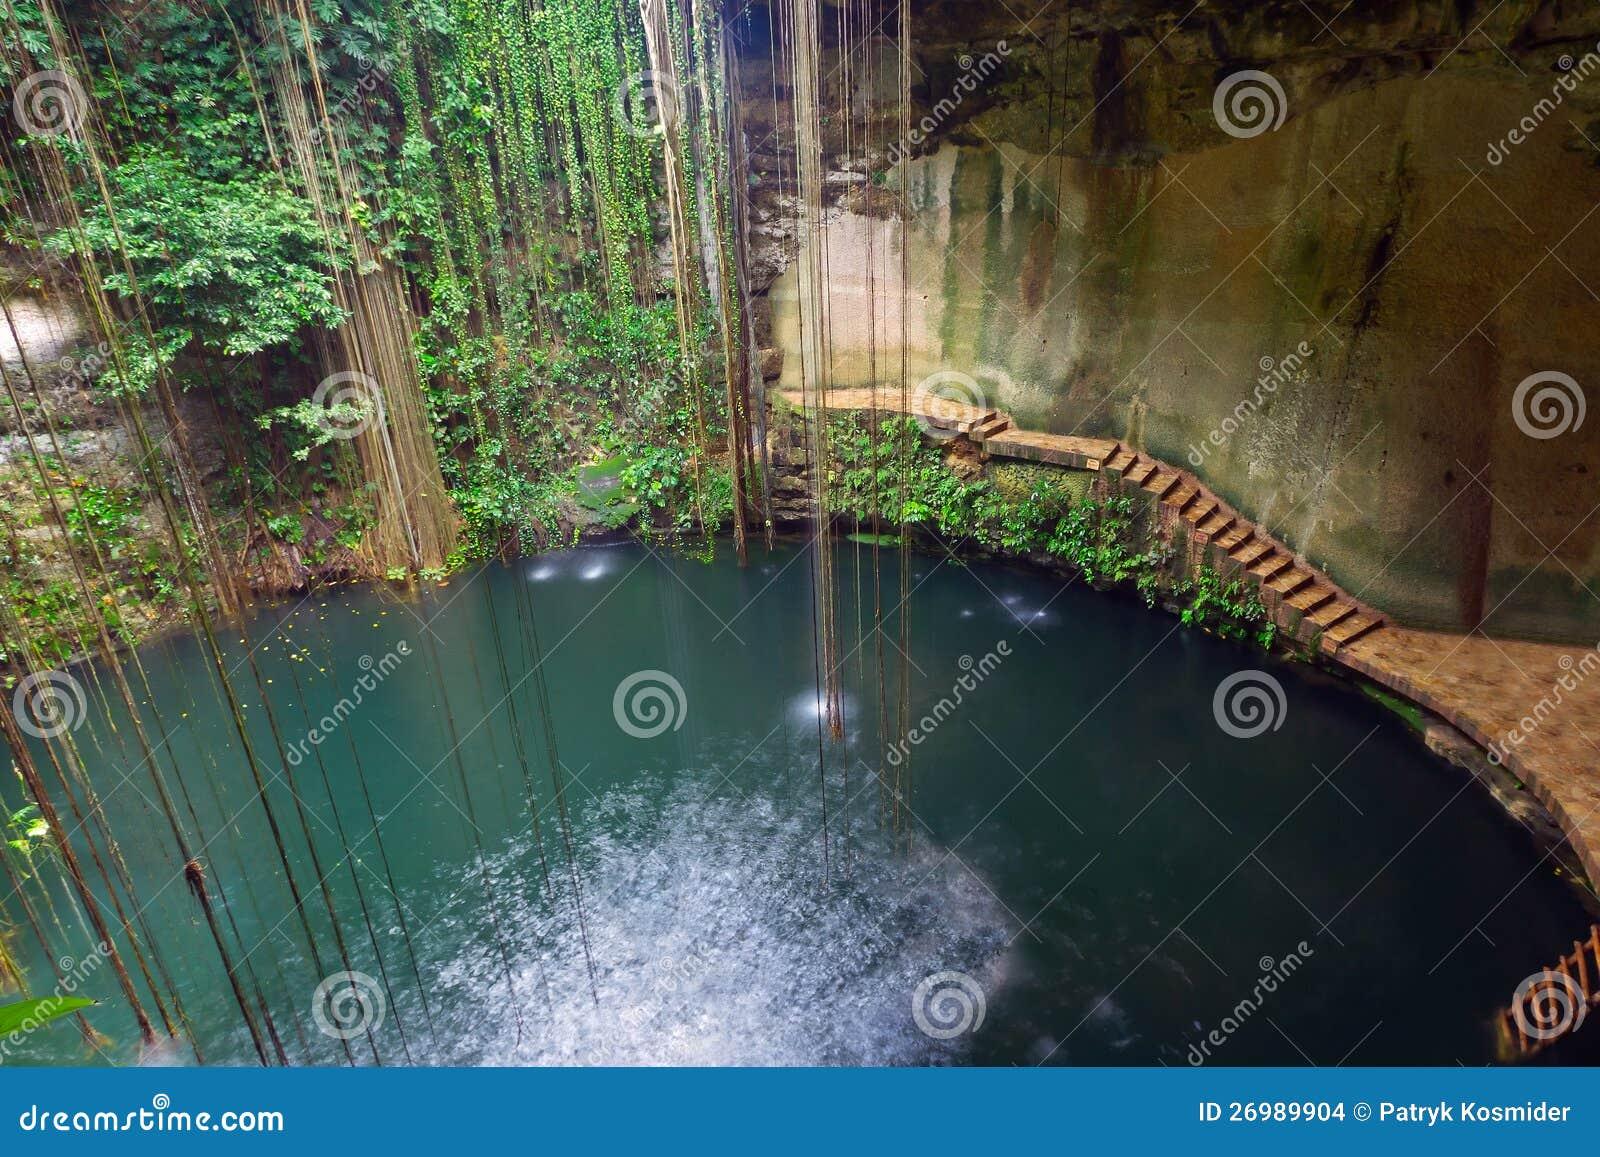 Underground Pool Ik Kil Cenote In Mexico Stock Photo